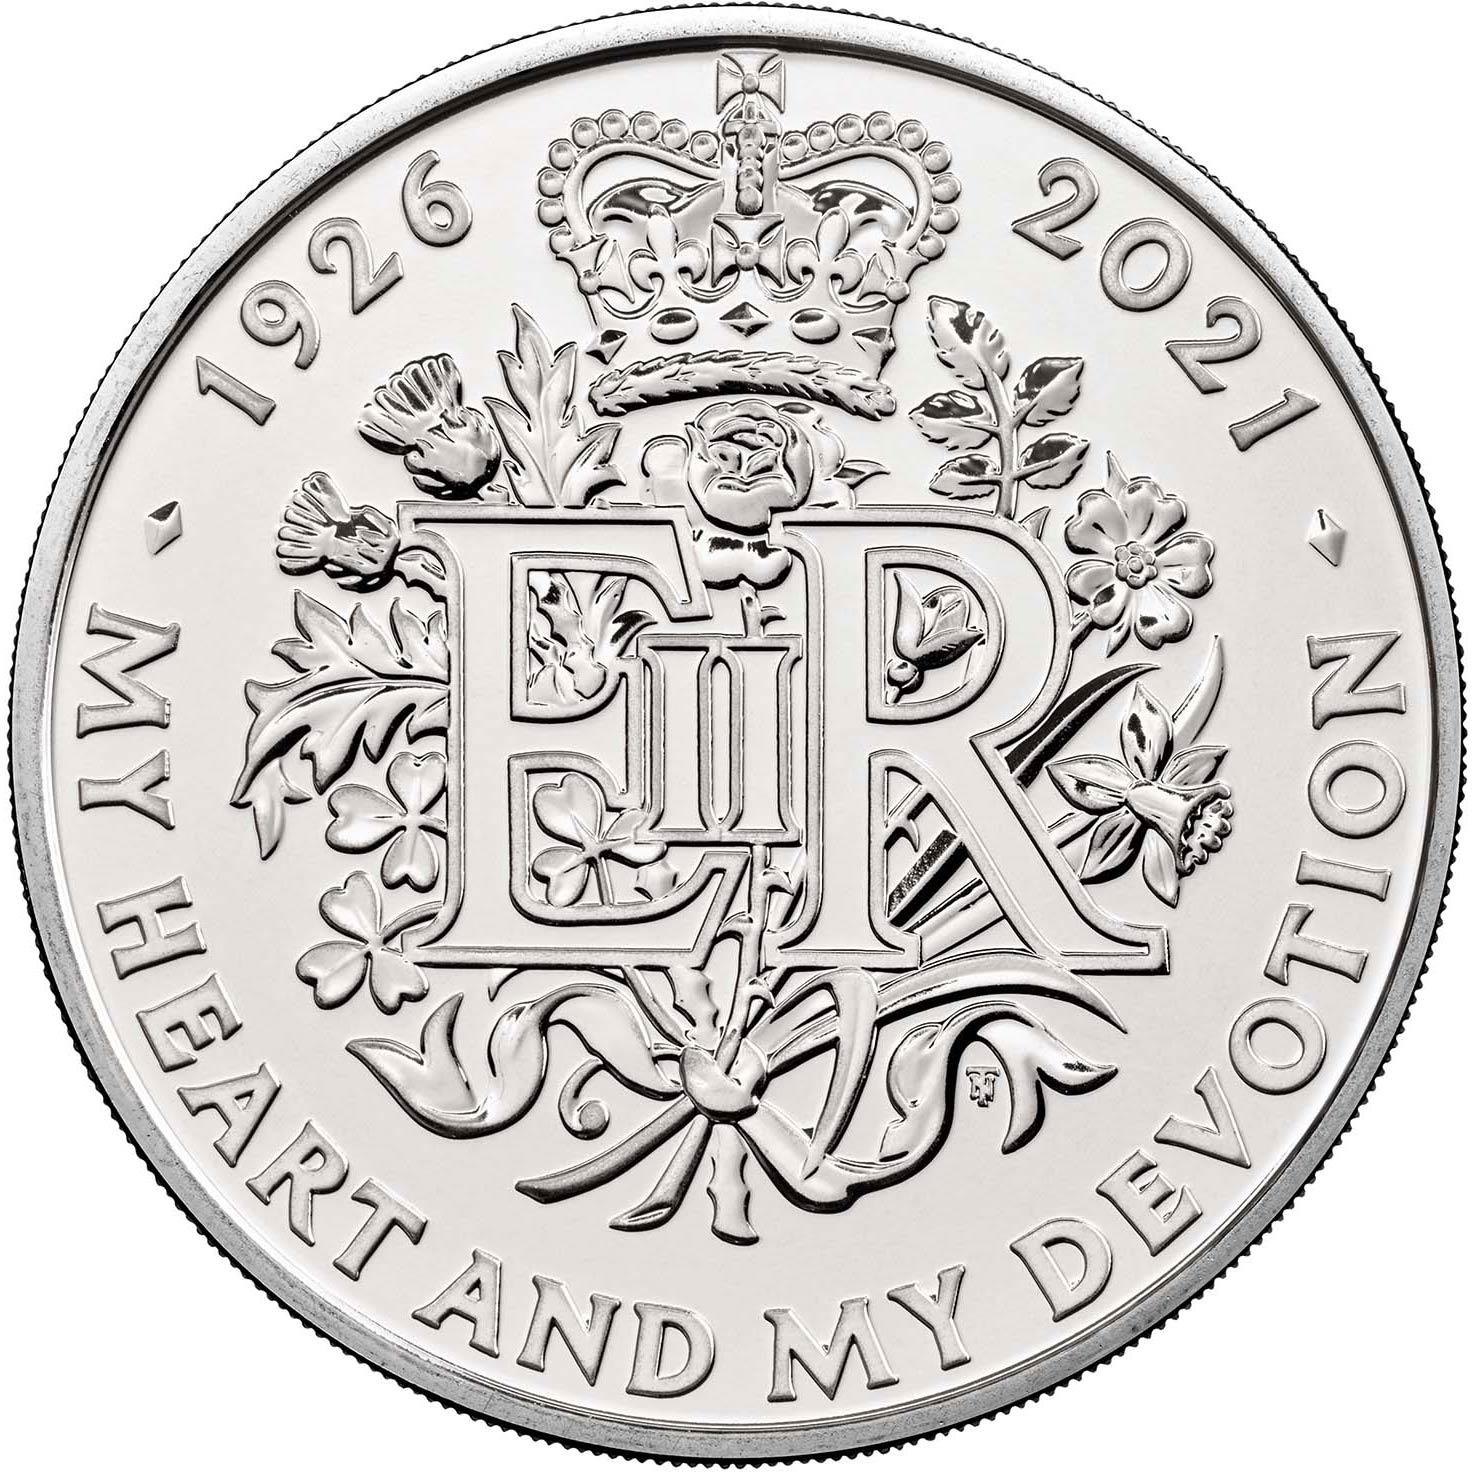 2002 1 pound coin value